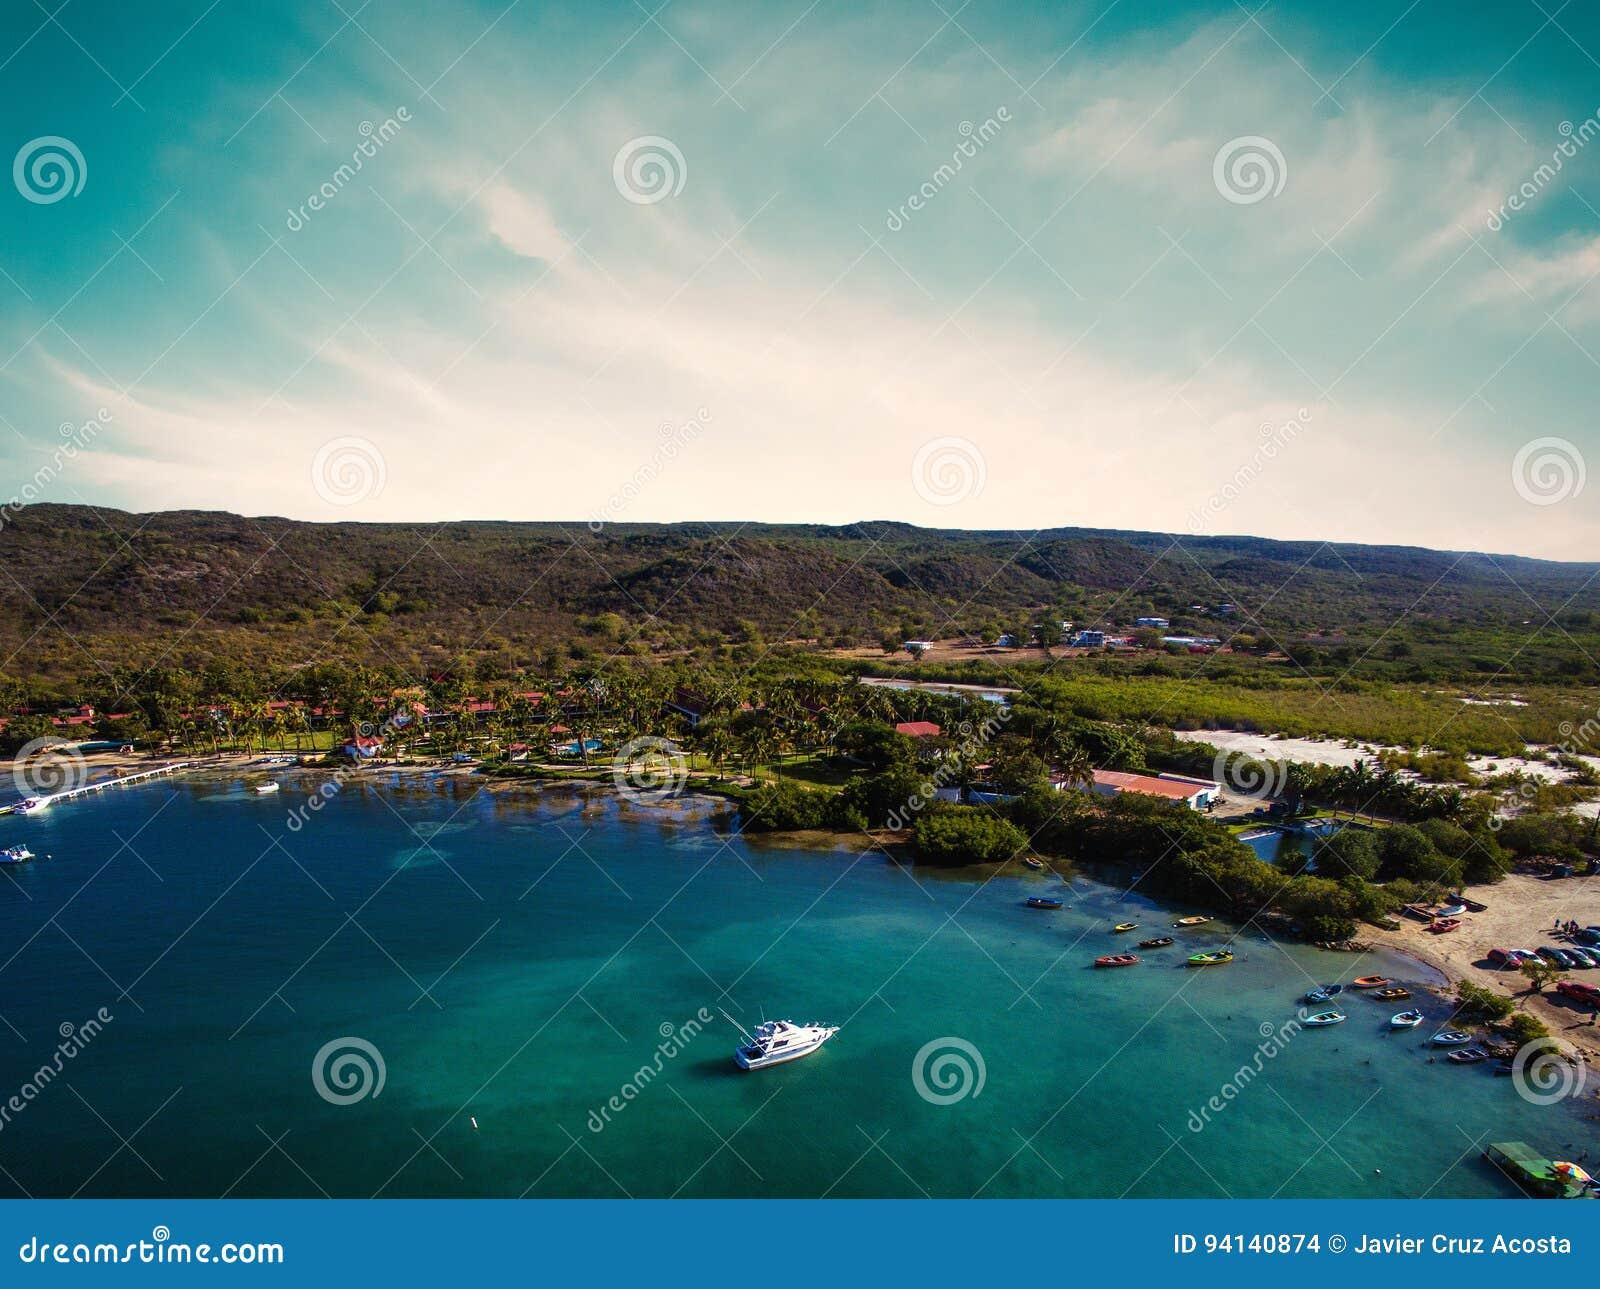 South coast of Puerto Rico